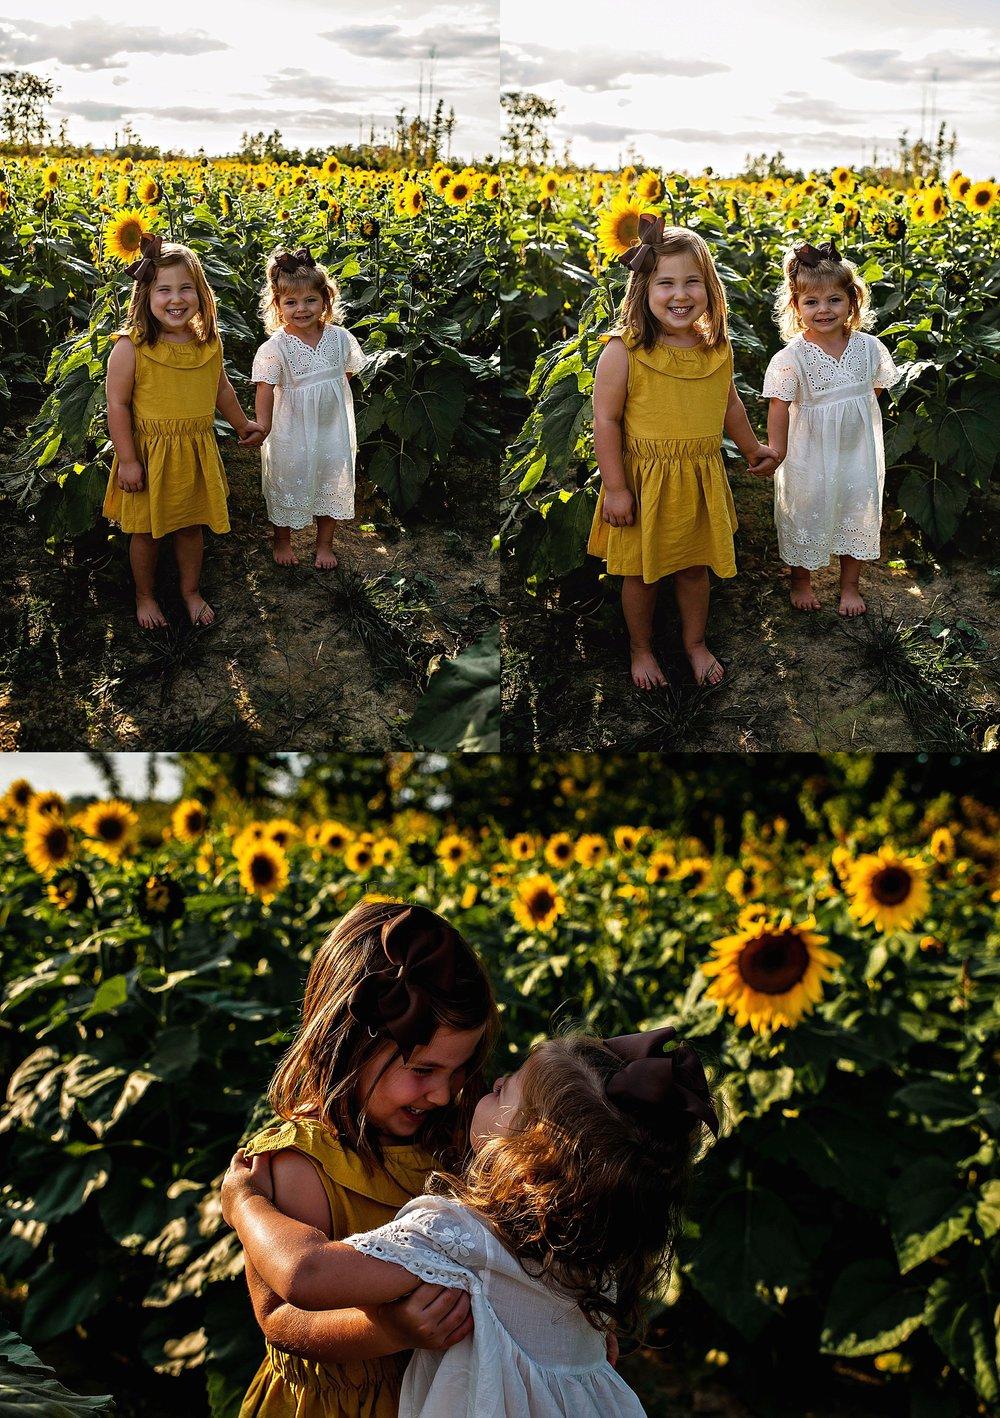 Rutherford-family-cleveland-photographer-lauren-grayson-sunflower-field-session_0002.jpg